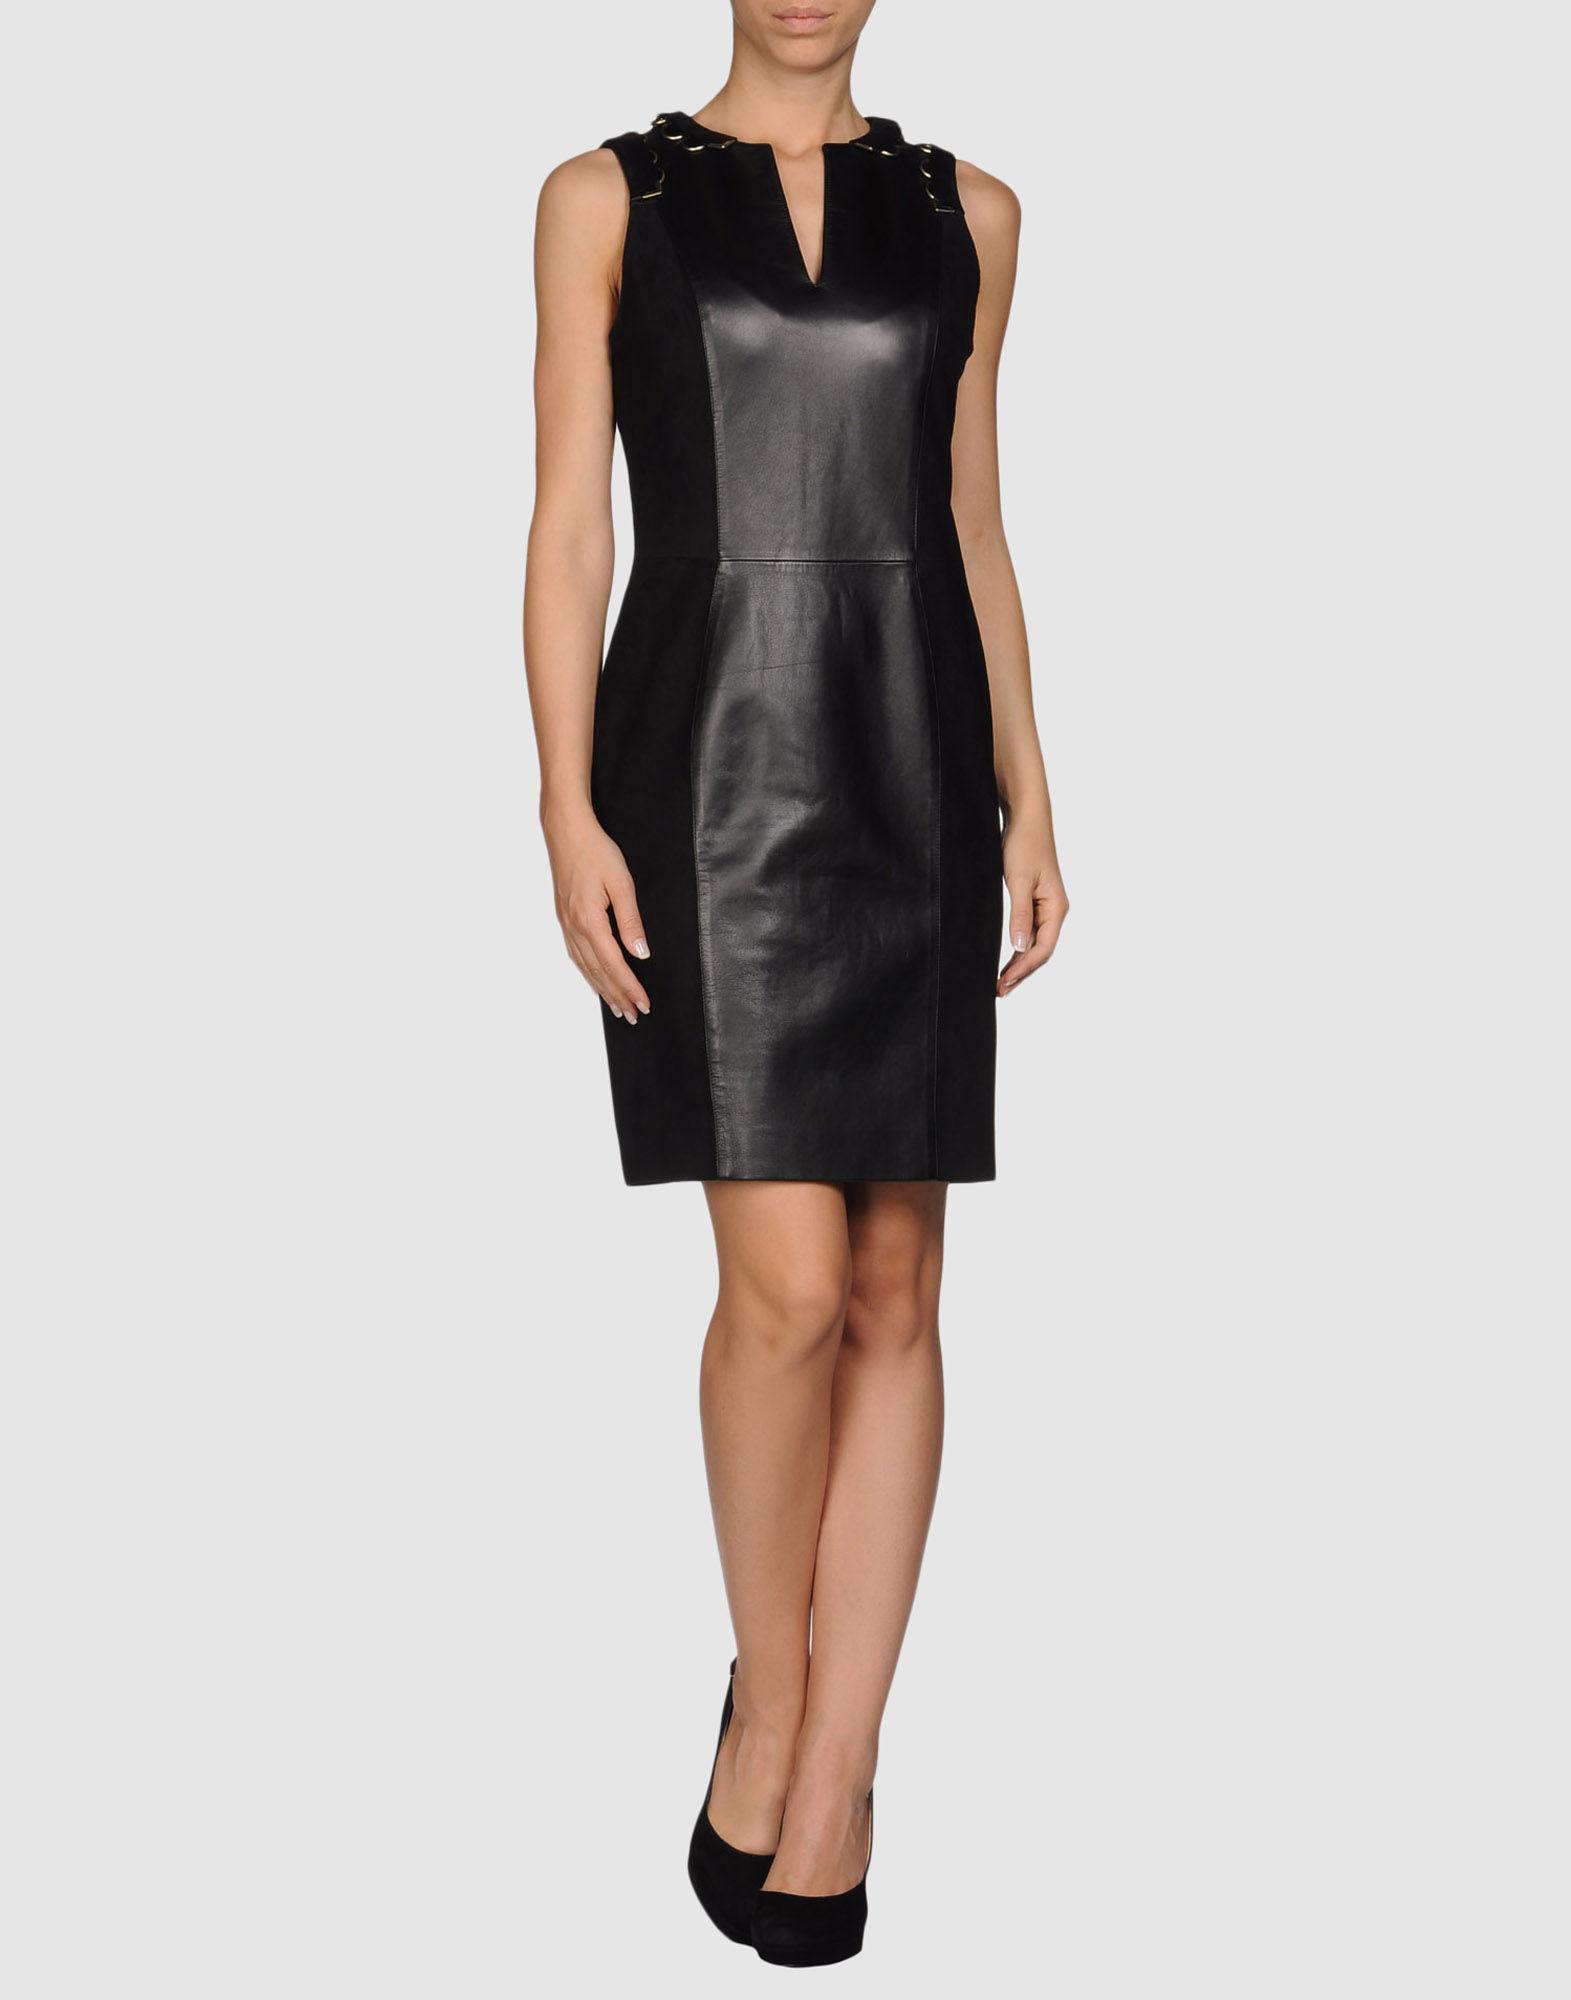 34225016BM 14 f - Evening Φορεματα Versace 2011 2012 Κωδ.04